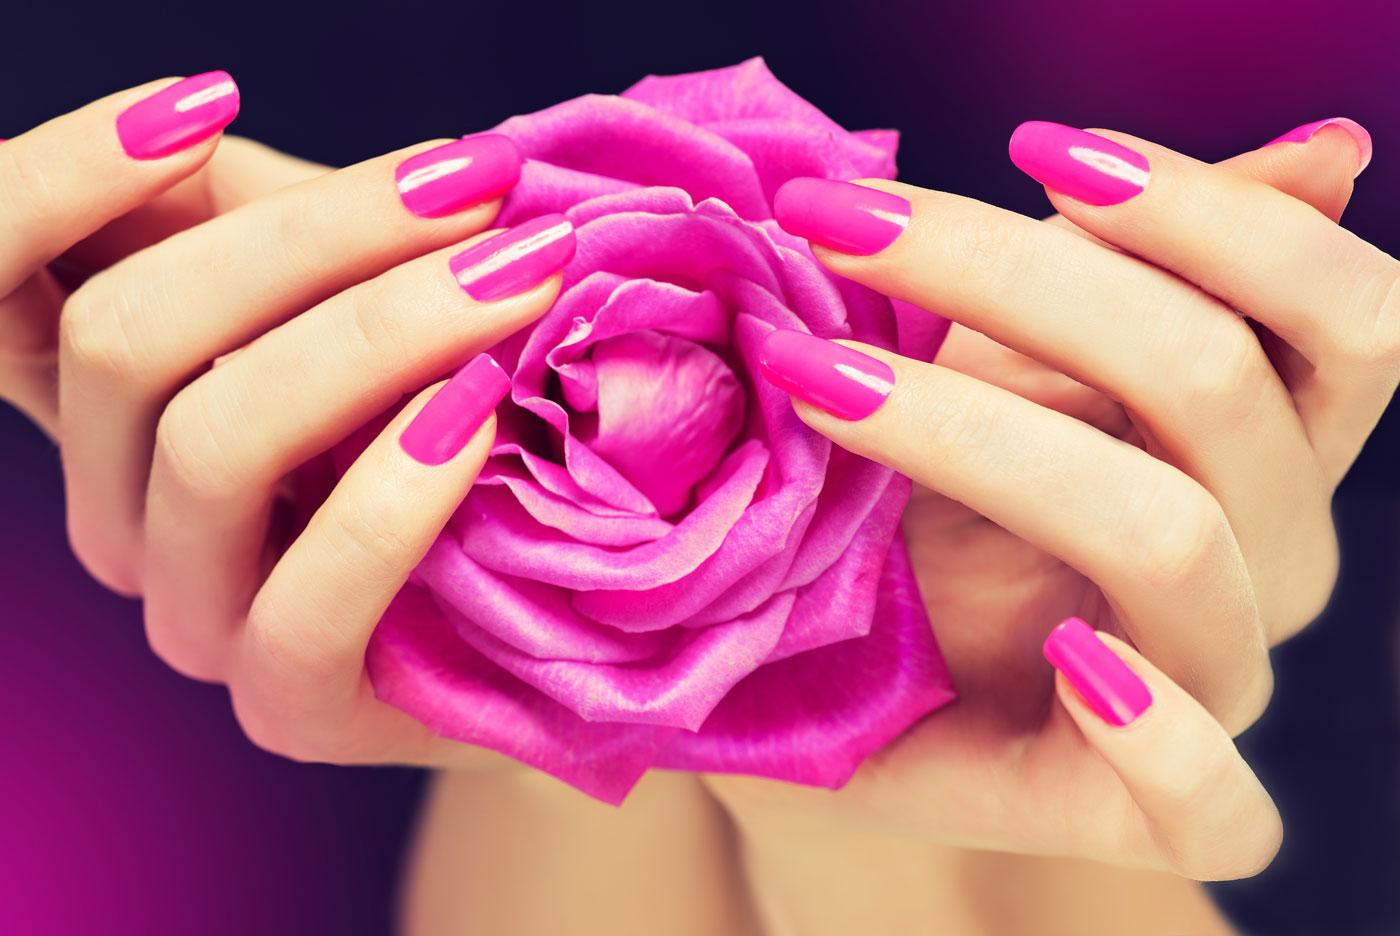 bigstock-Manicured-hands-with-bright-pi-121323041.jpg